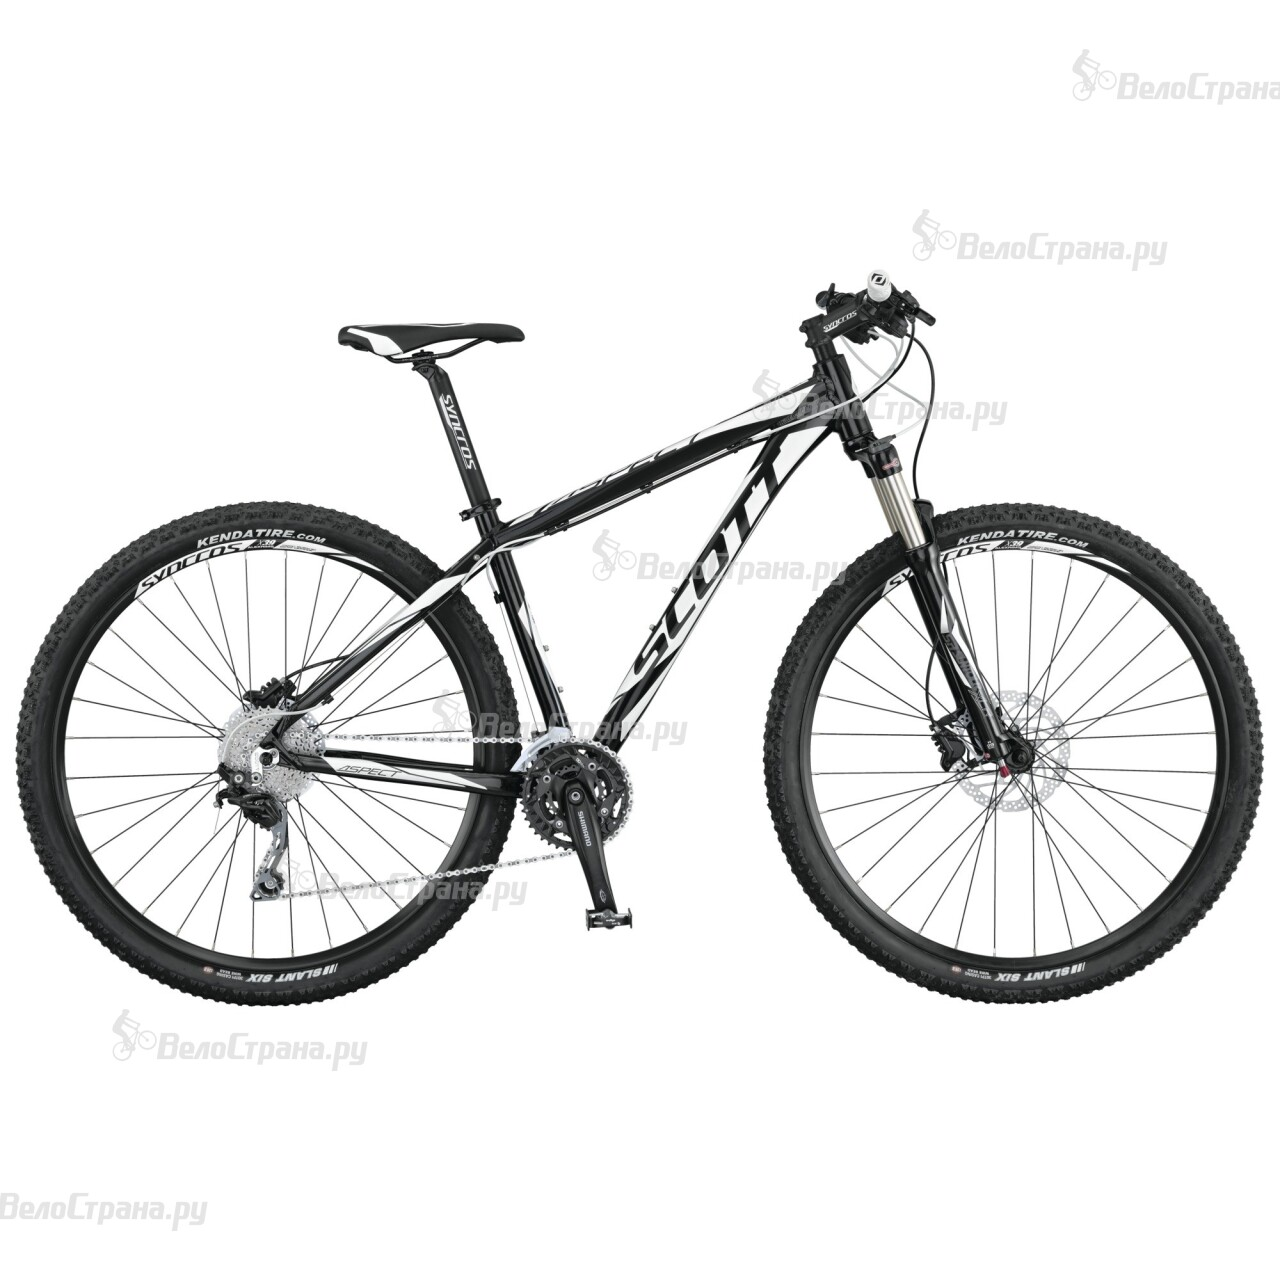 Велосипед Scott Aspect 920 (2015) велосипед scott aspect 920 29 2016